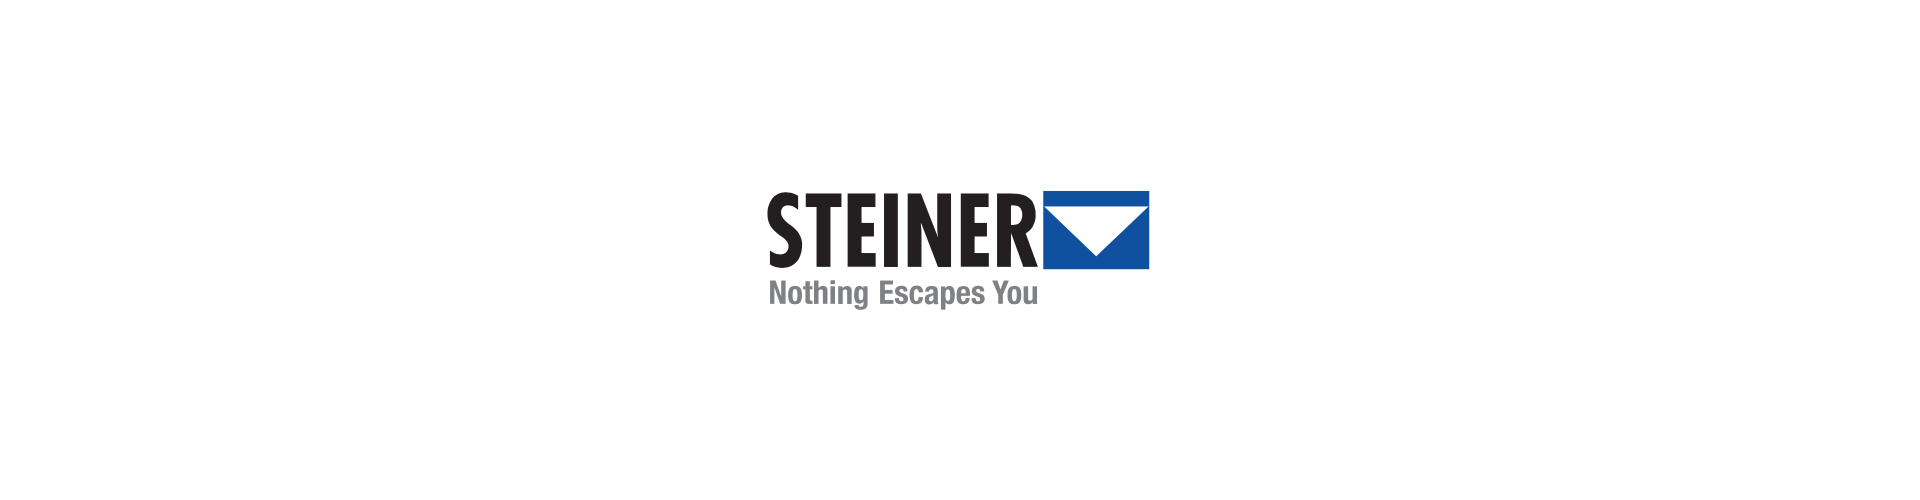 Steiner håndkikkert - Eminente Steiner håndkikkerter til jagt - Billig fragt